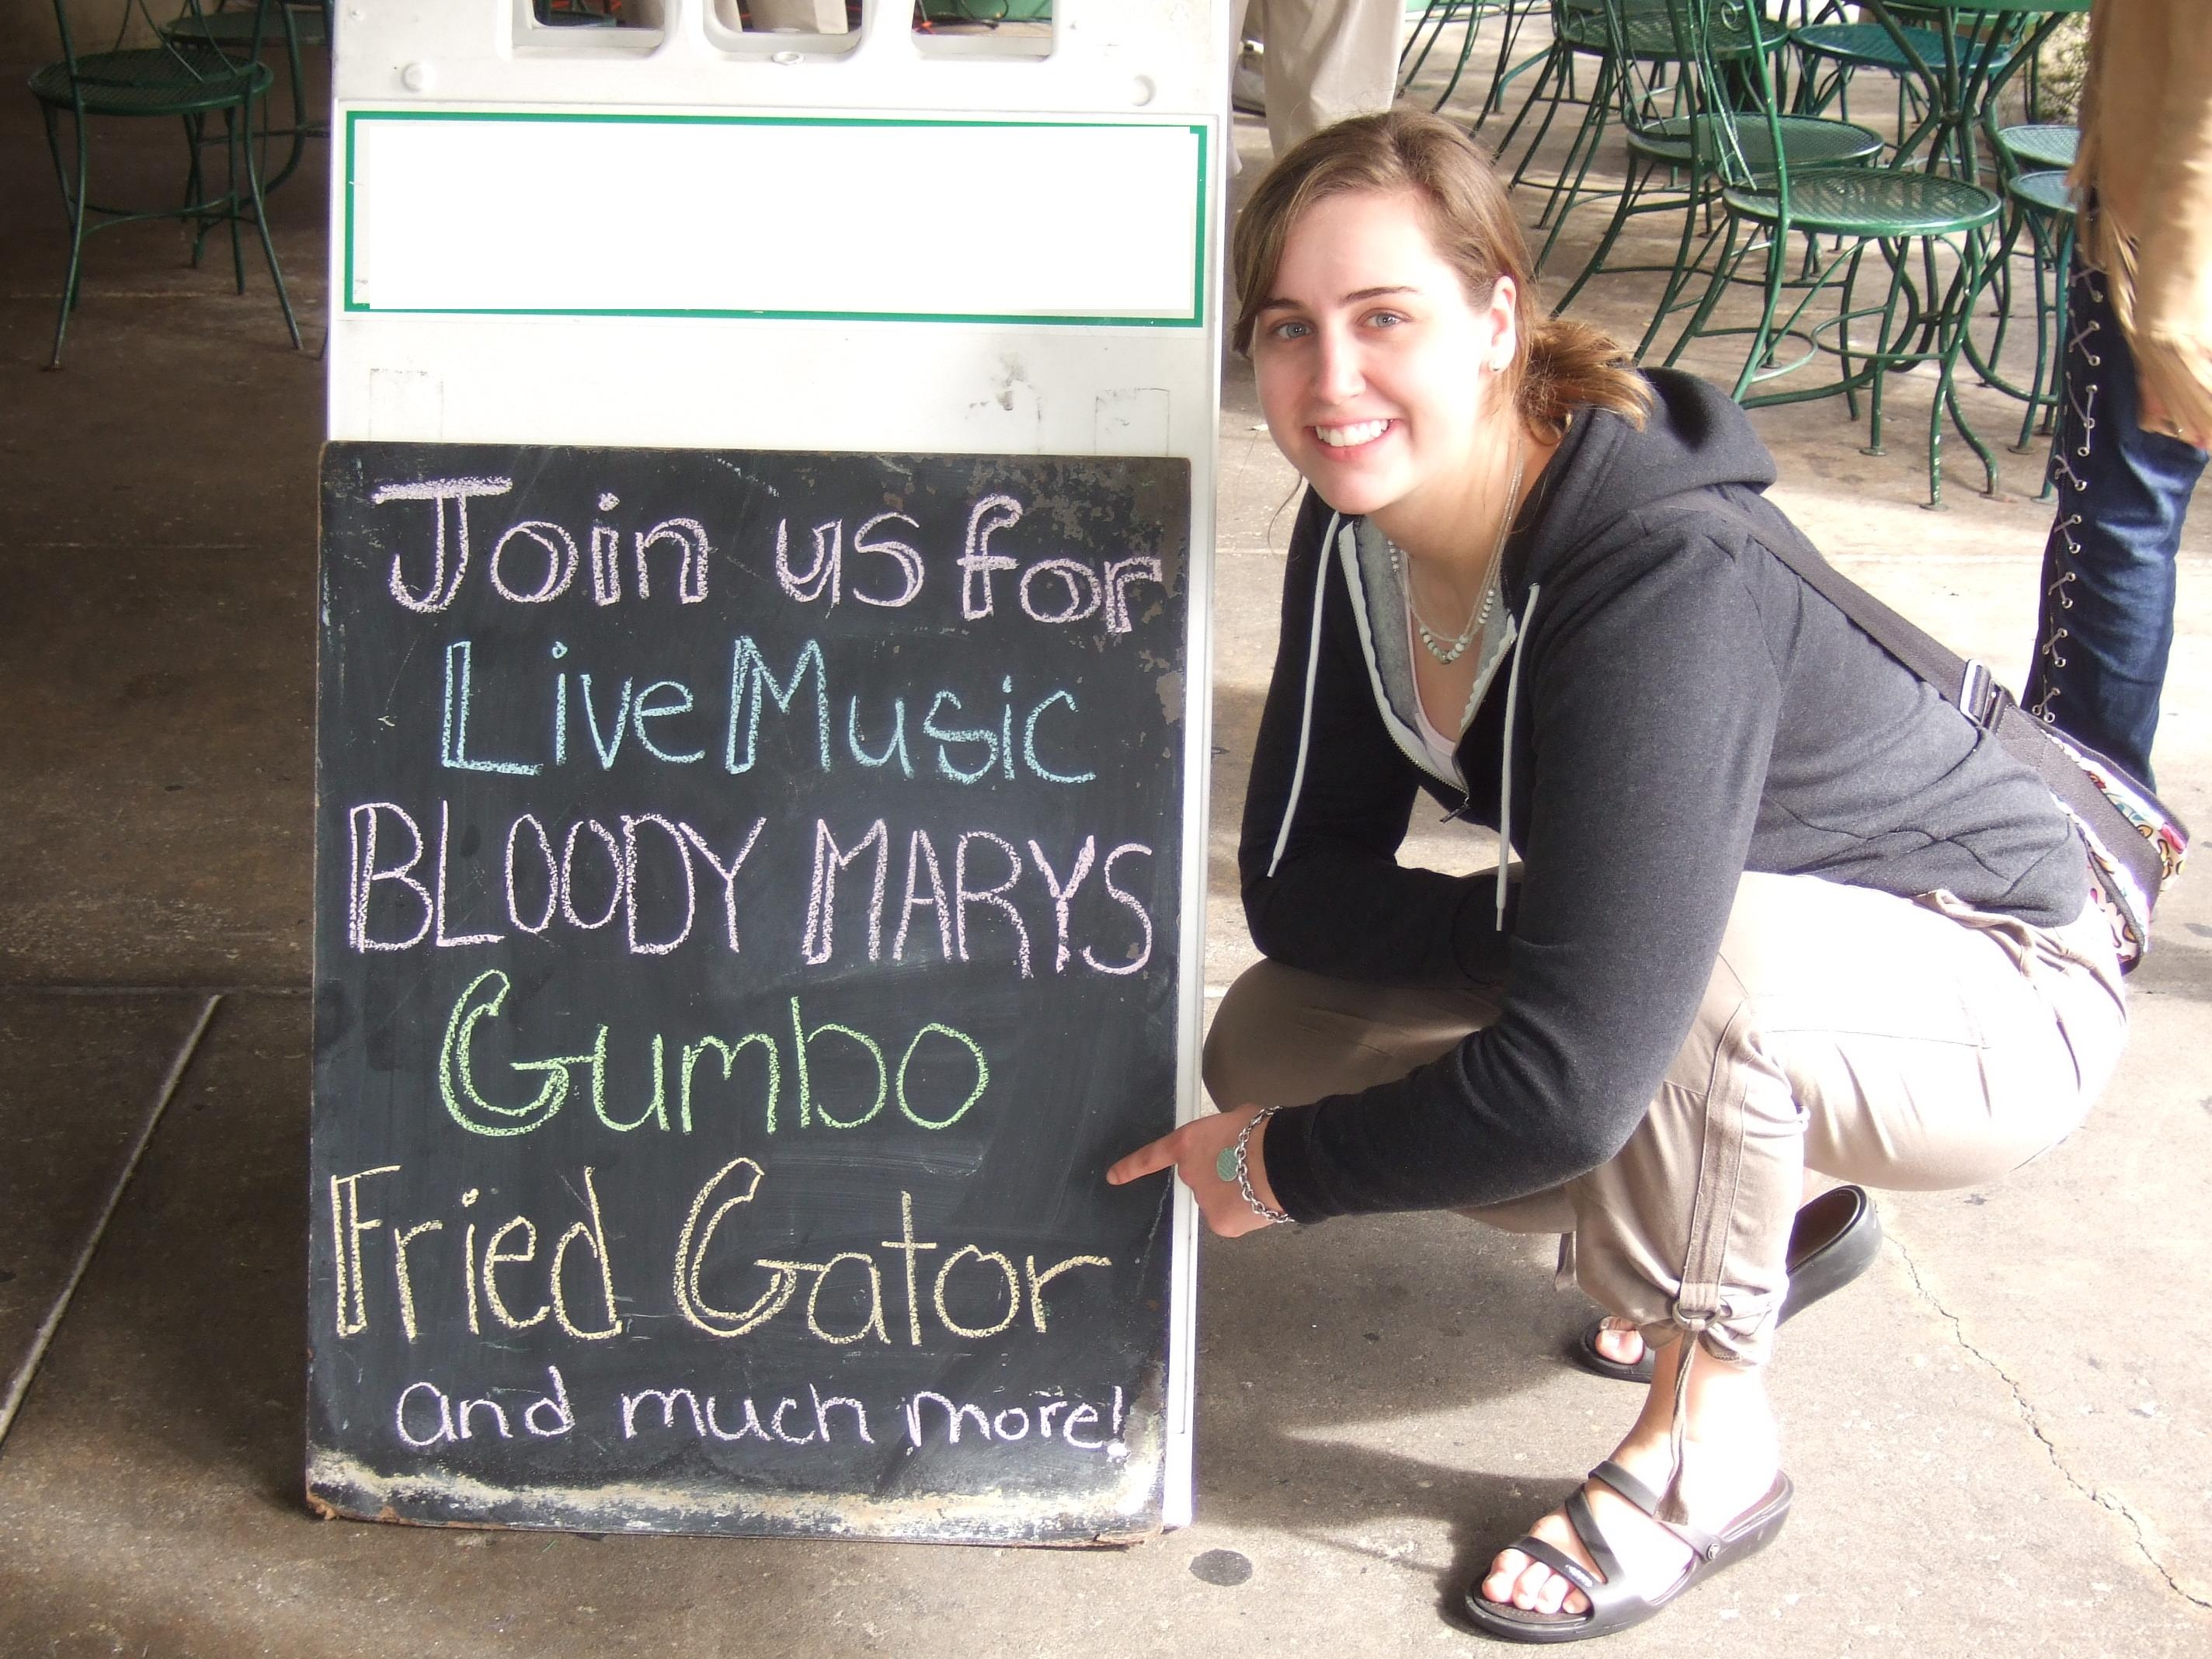 A menu board listing blood marys, gumbo, and fried gator